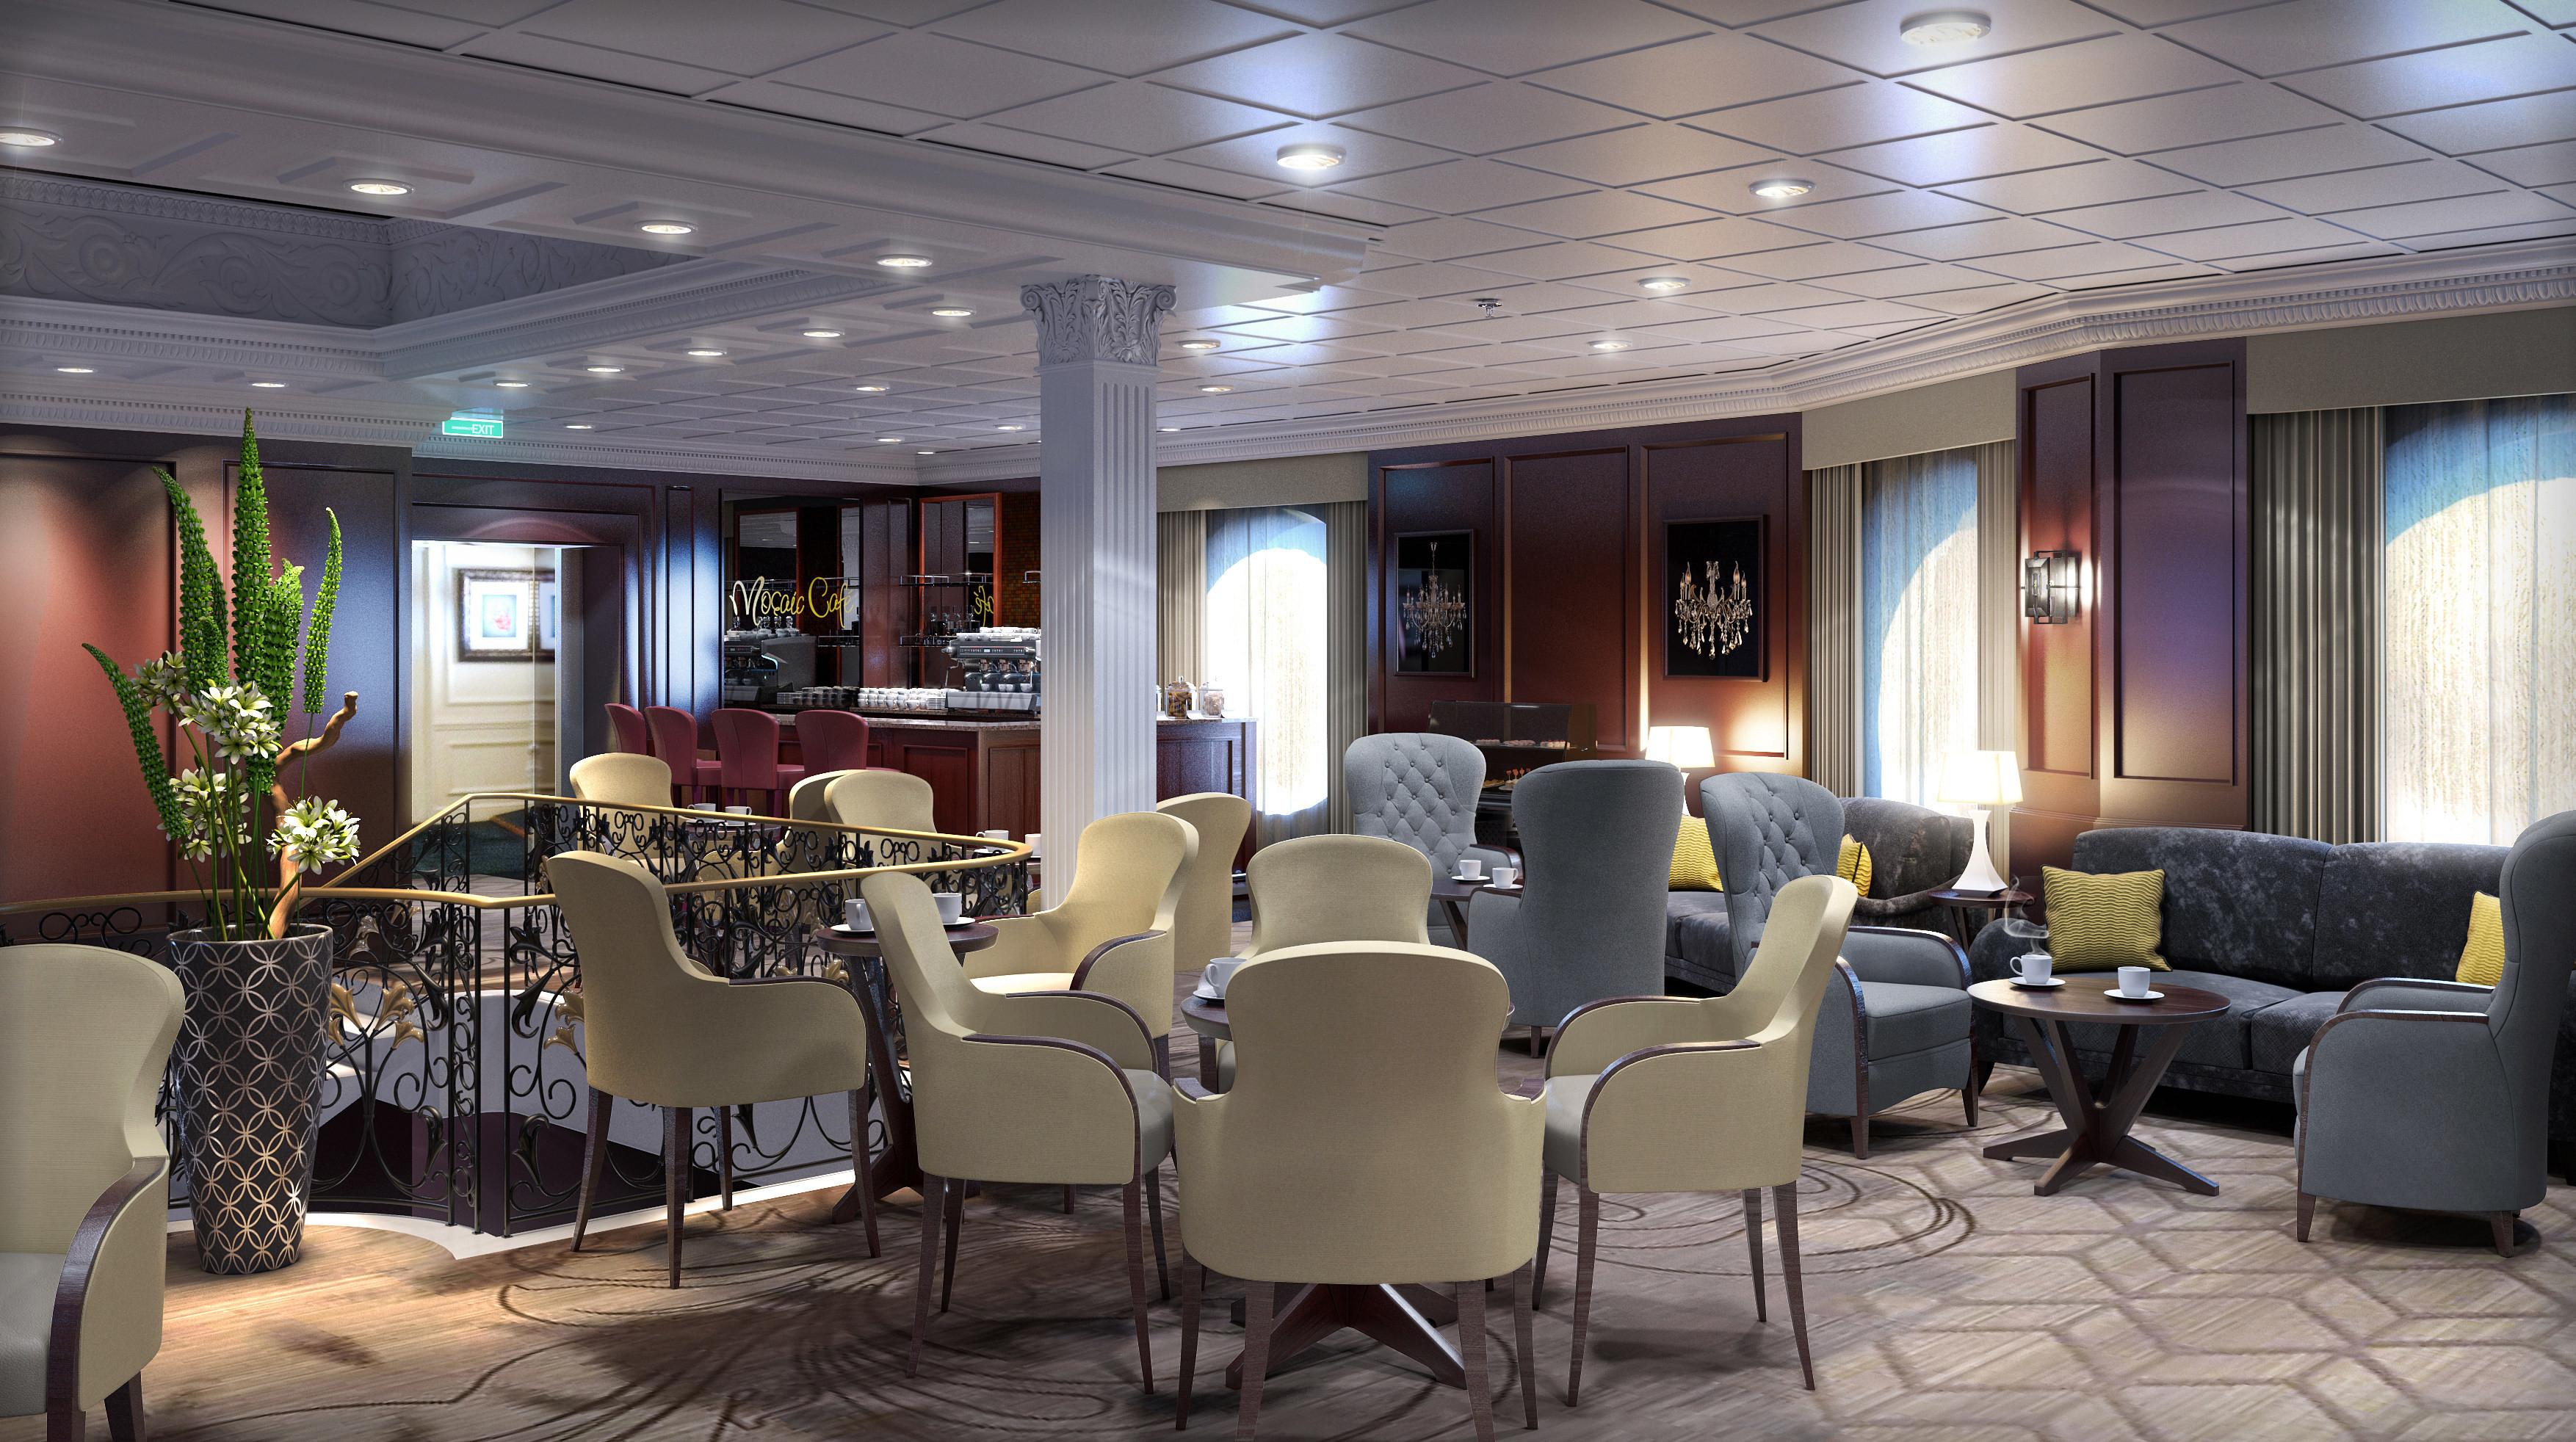 Mosaic Cafe - Azamara - PerryGolf Cruising